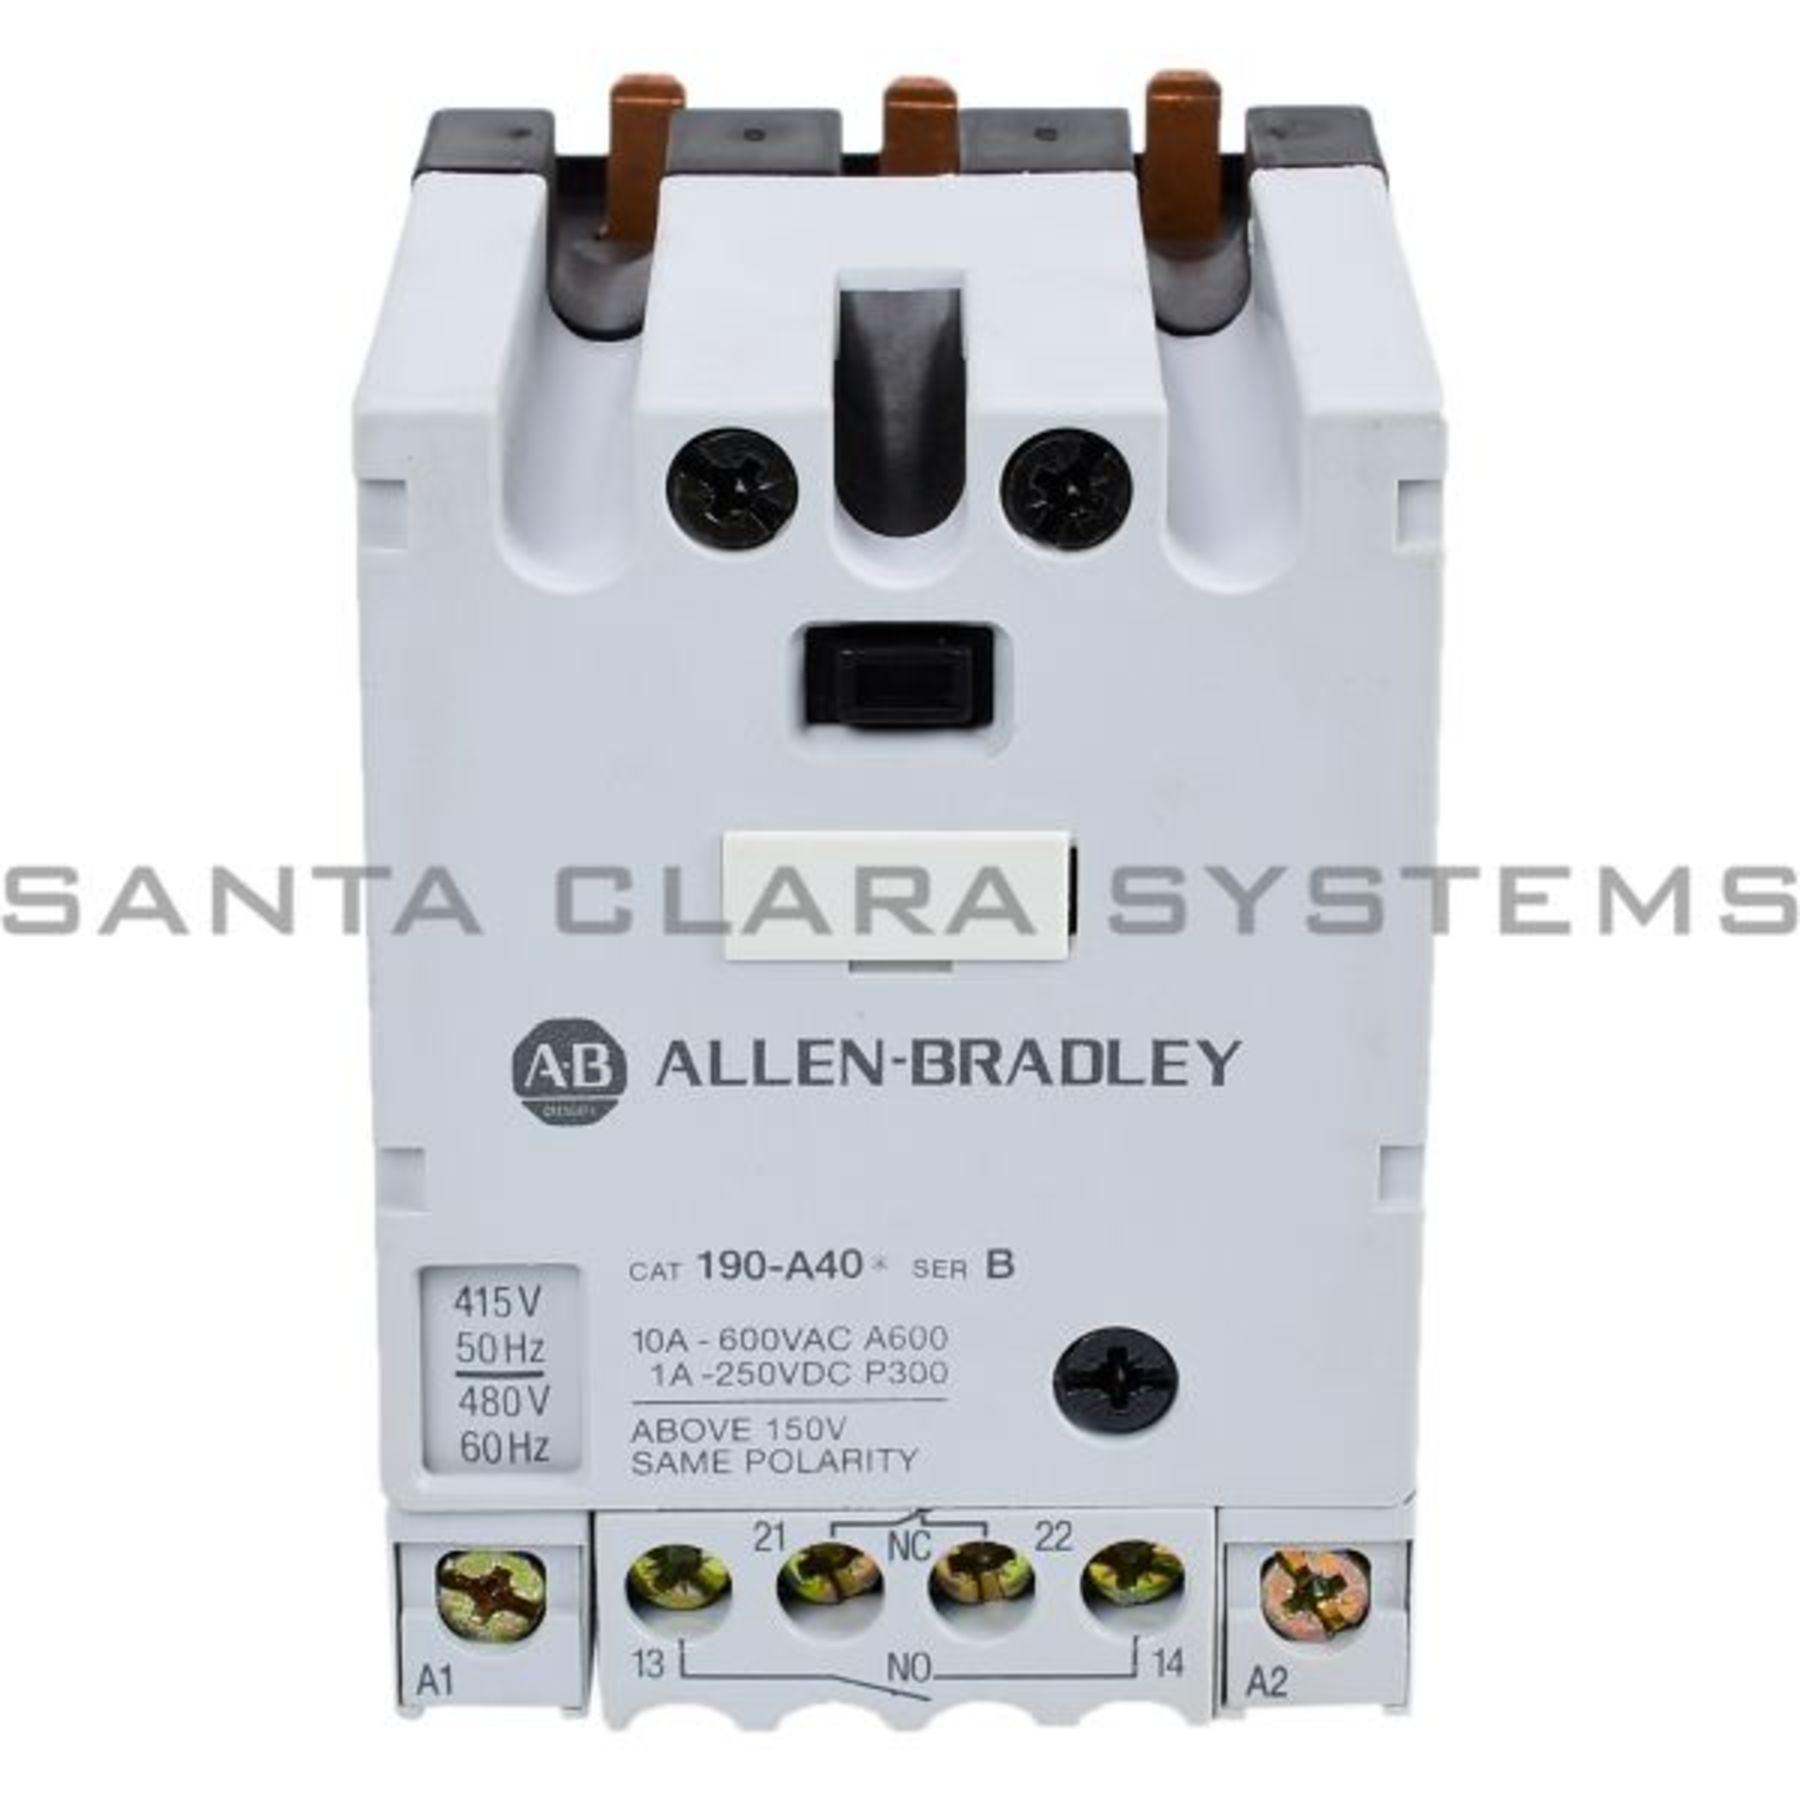 190-A40B Allen Bradley Contactor Module Out of Stock - Santa